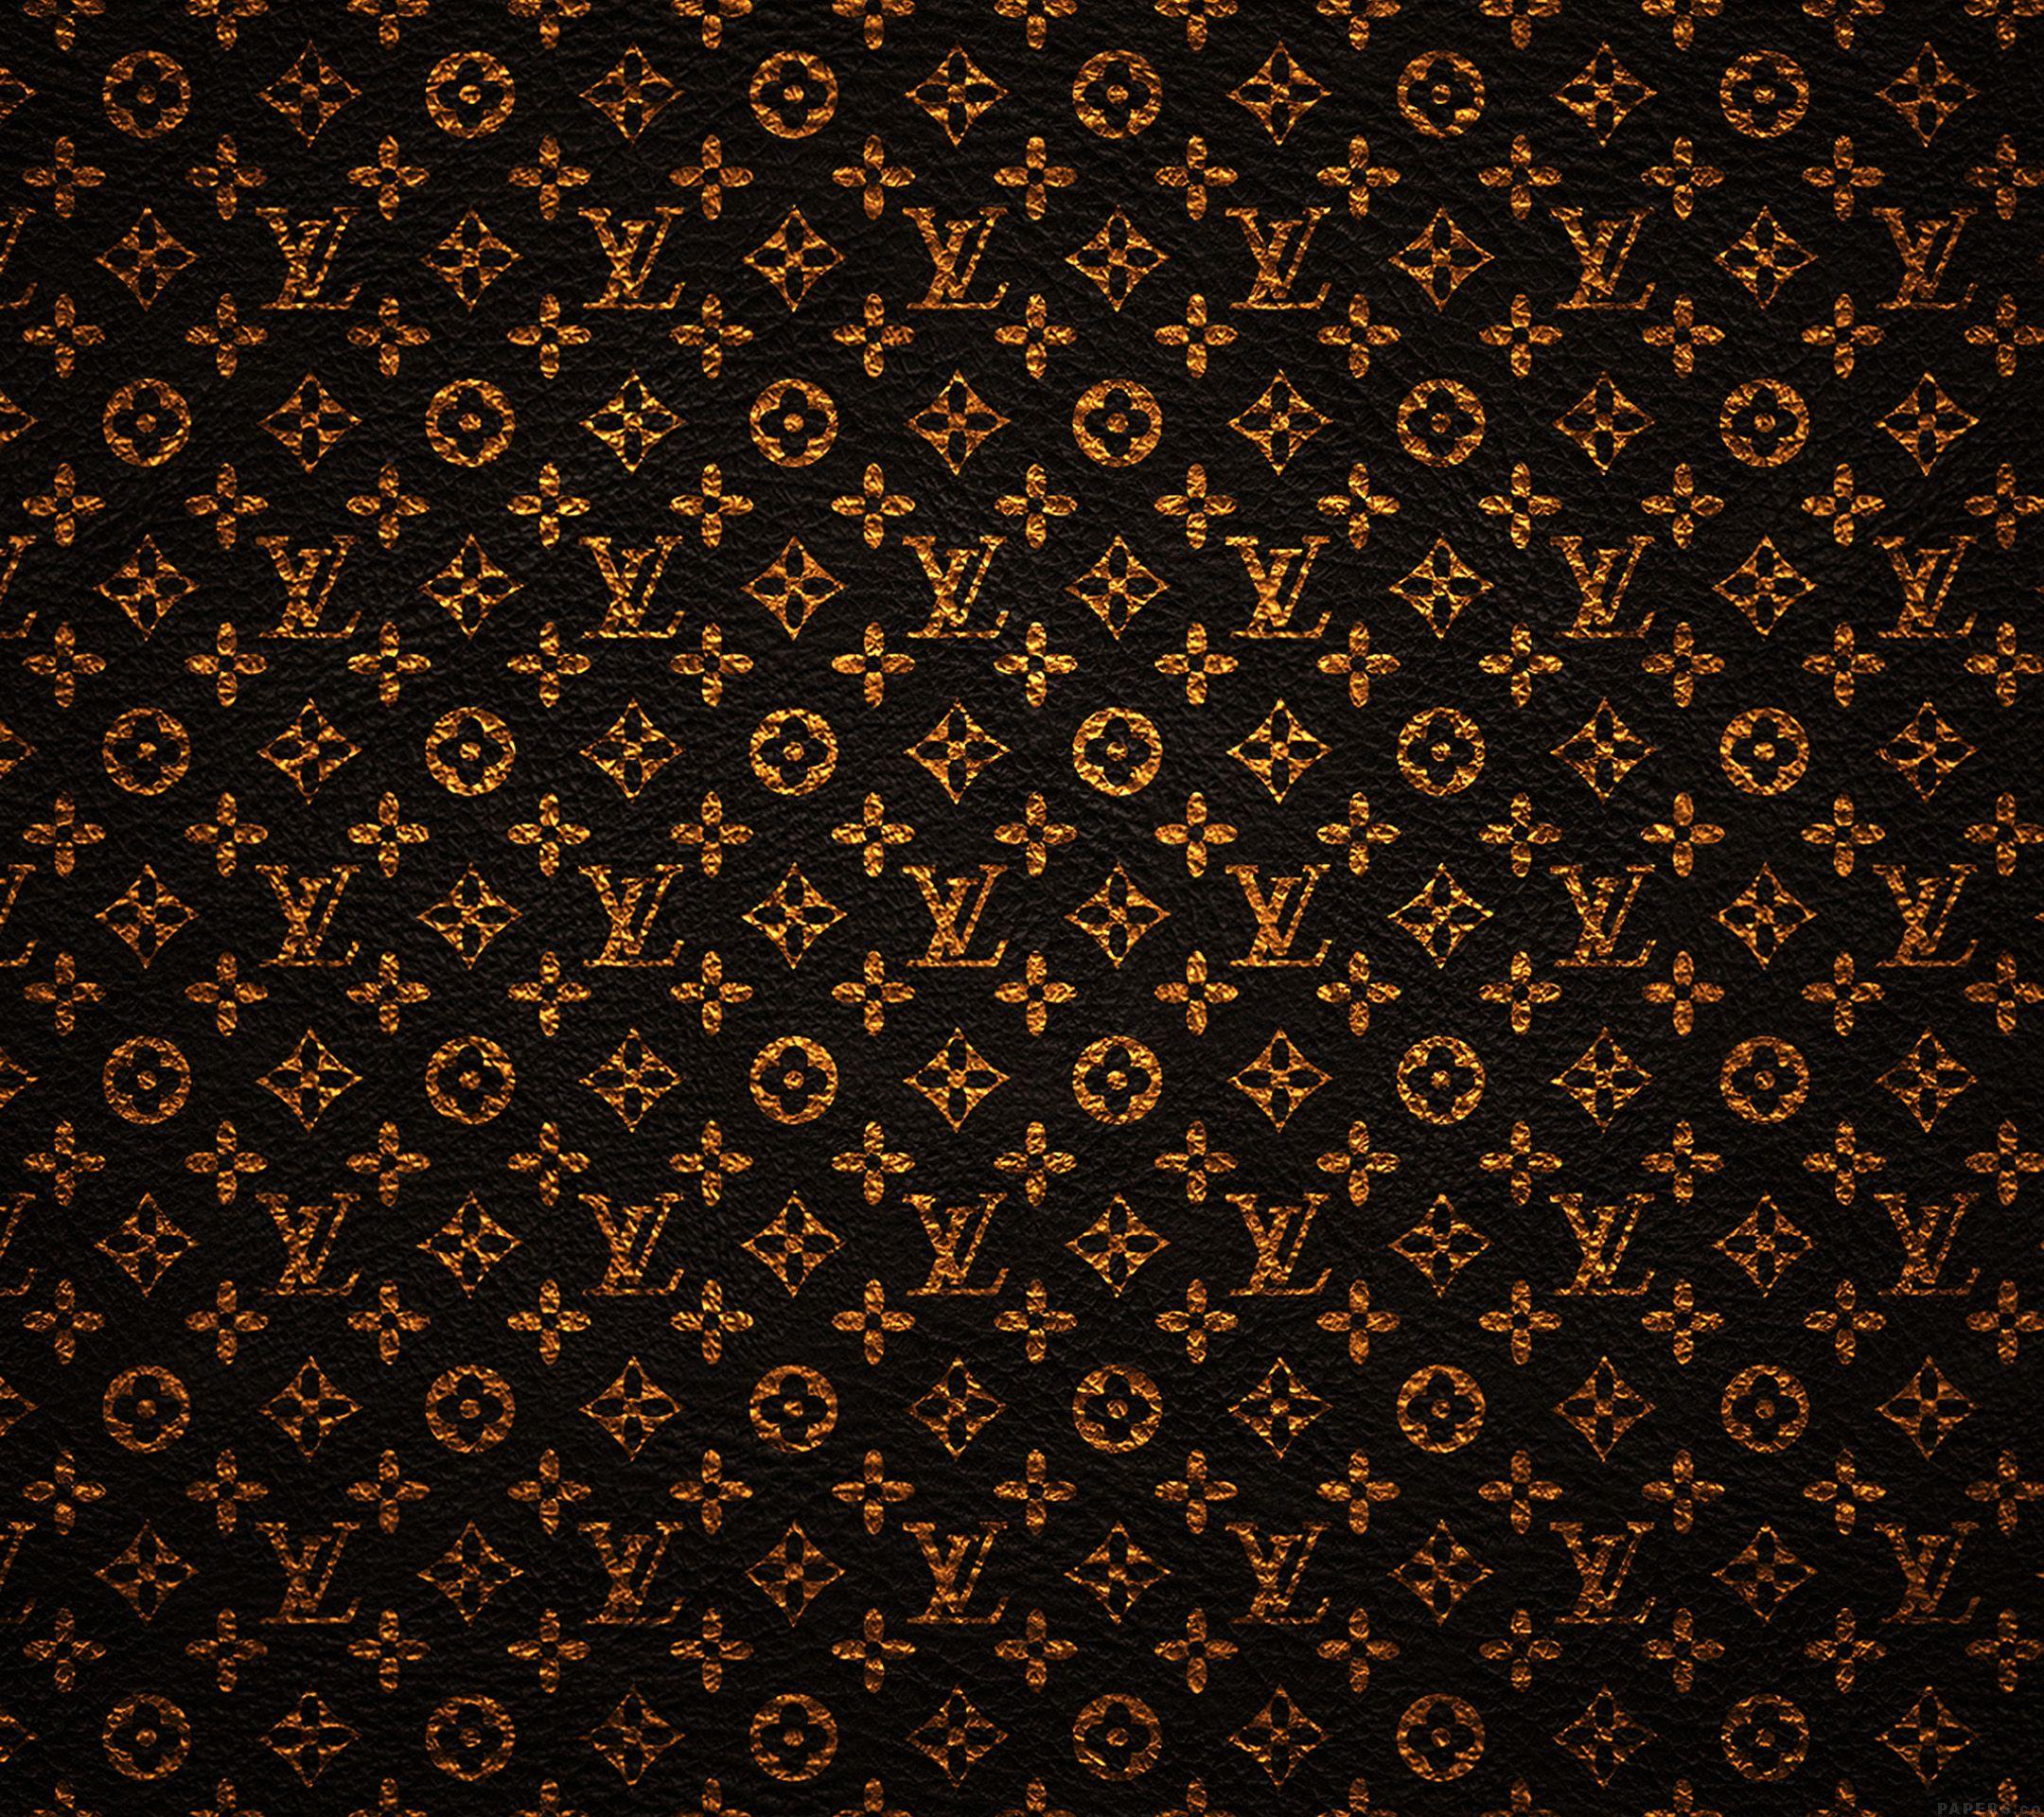 #Louis_Vuitton #LV #Vuitton #background #wallpaper